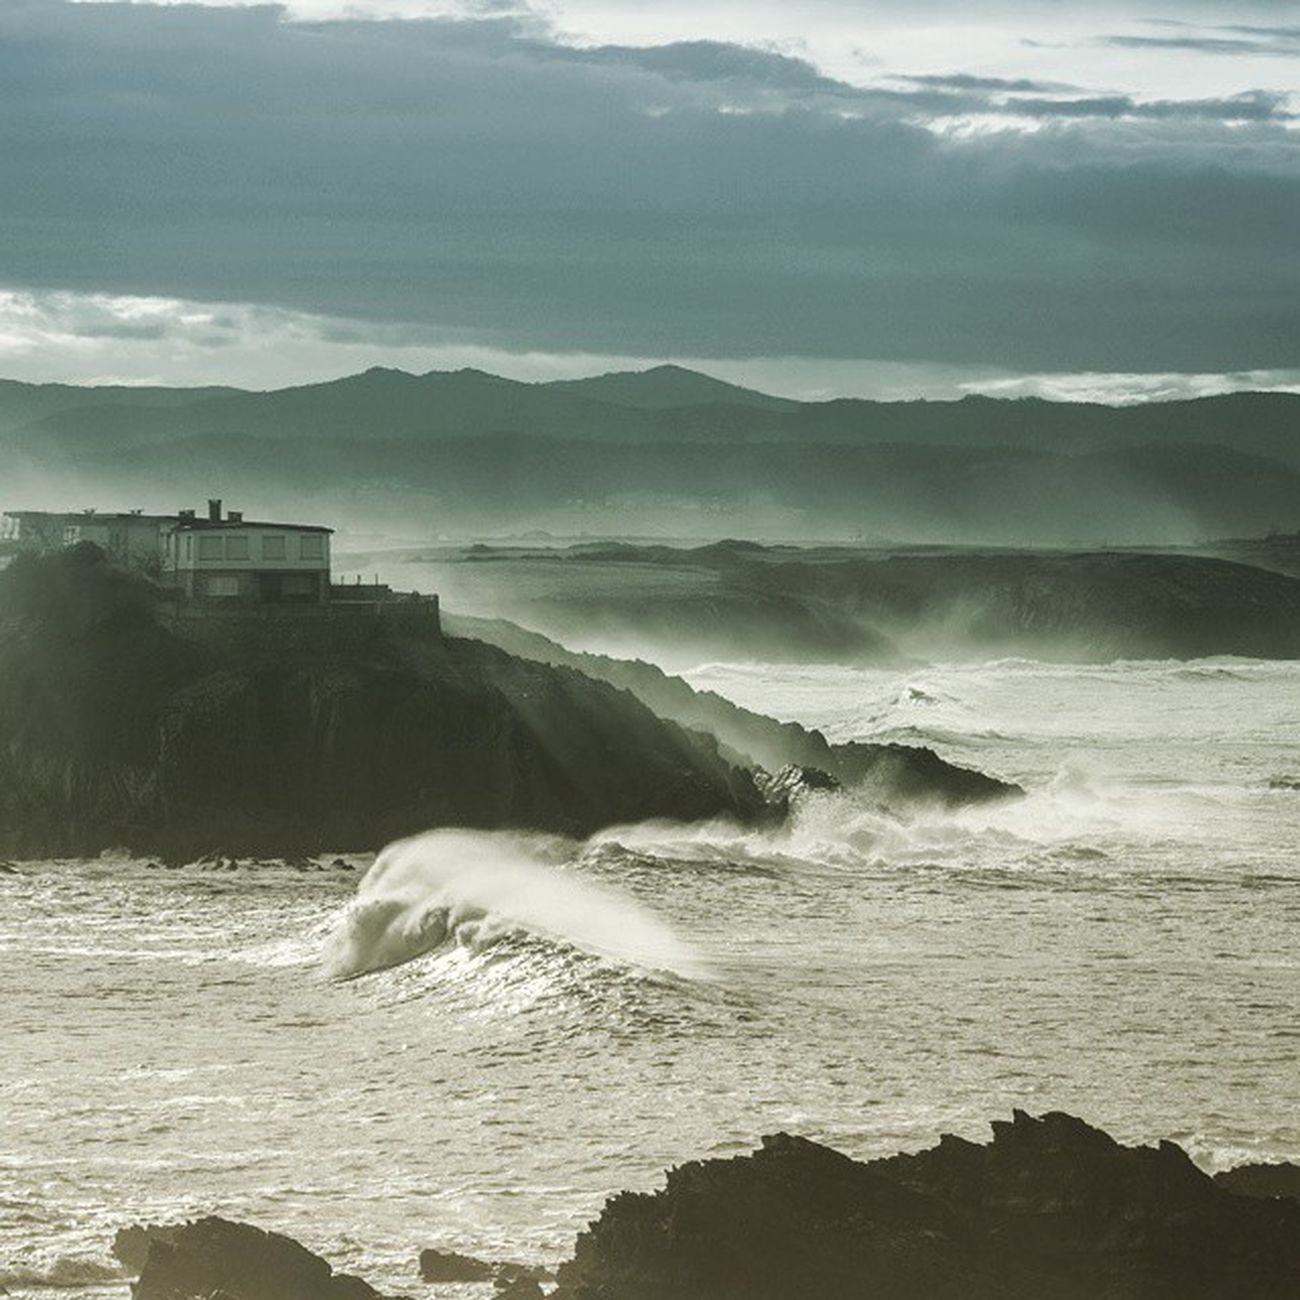 Ola Wave Tapia Tapiadecasariego Asturias Mar Cantábrico Reburdia Verano Summer Sun Sunny Sea Sky Surf